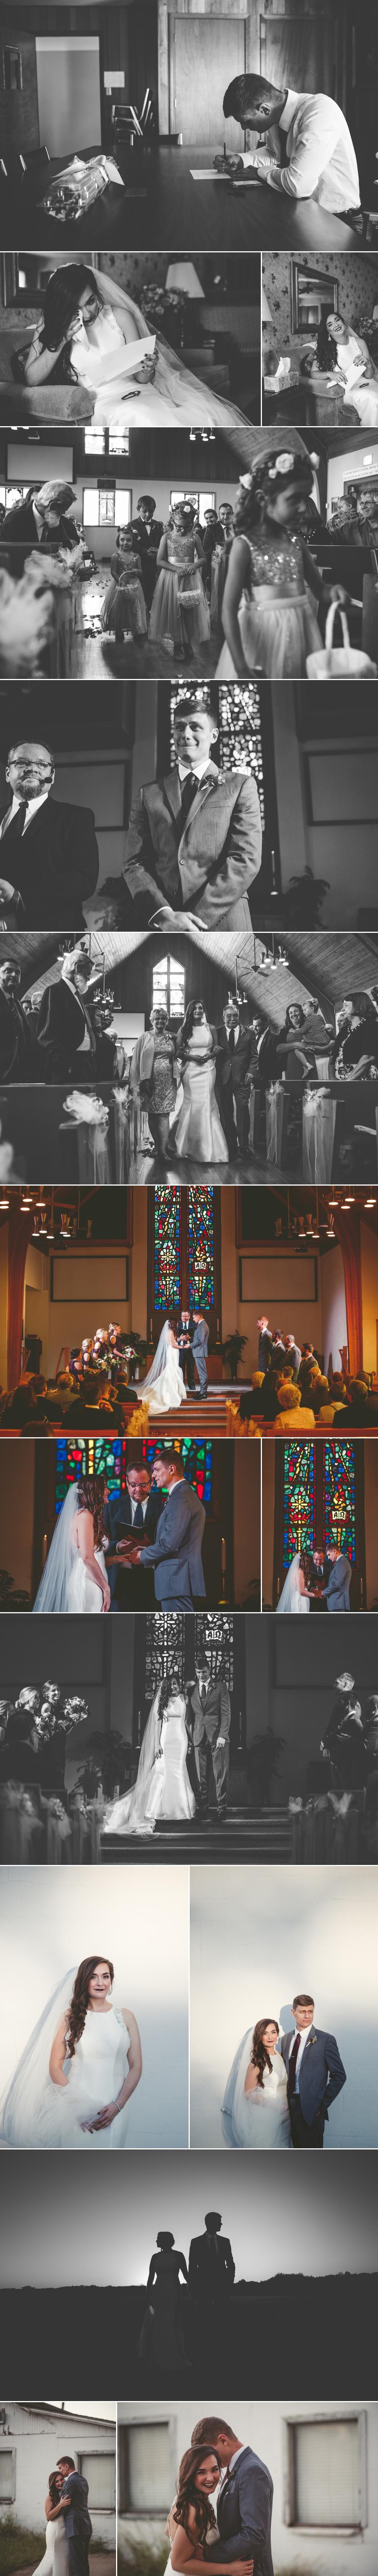 jason_domingues_photography_best_kansas_city_wedding_photographer_kc_weddings_tonganoxie_ks_brunswick_ballroom_0002.JPG